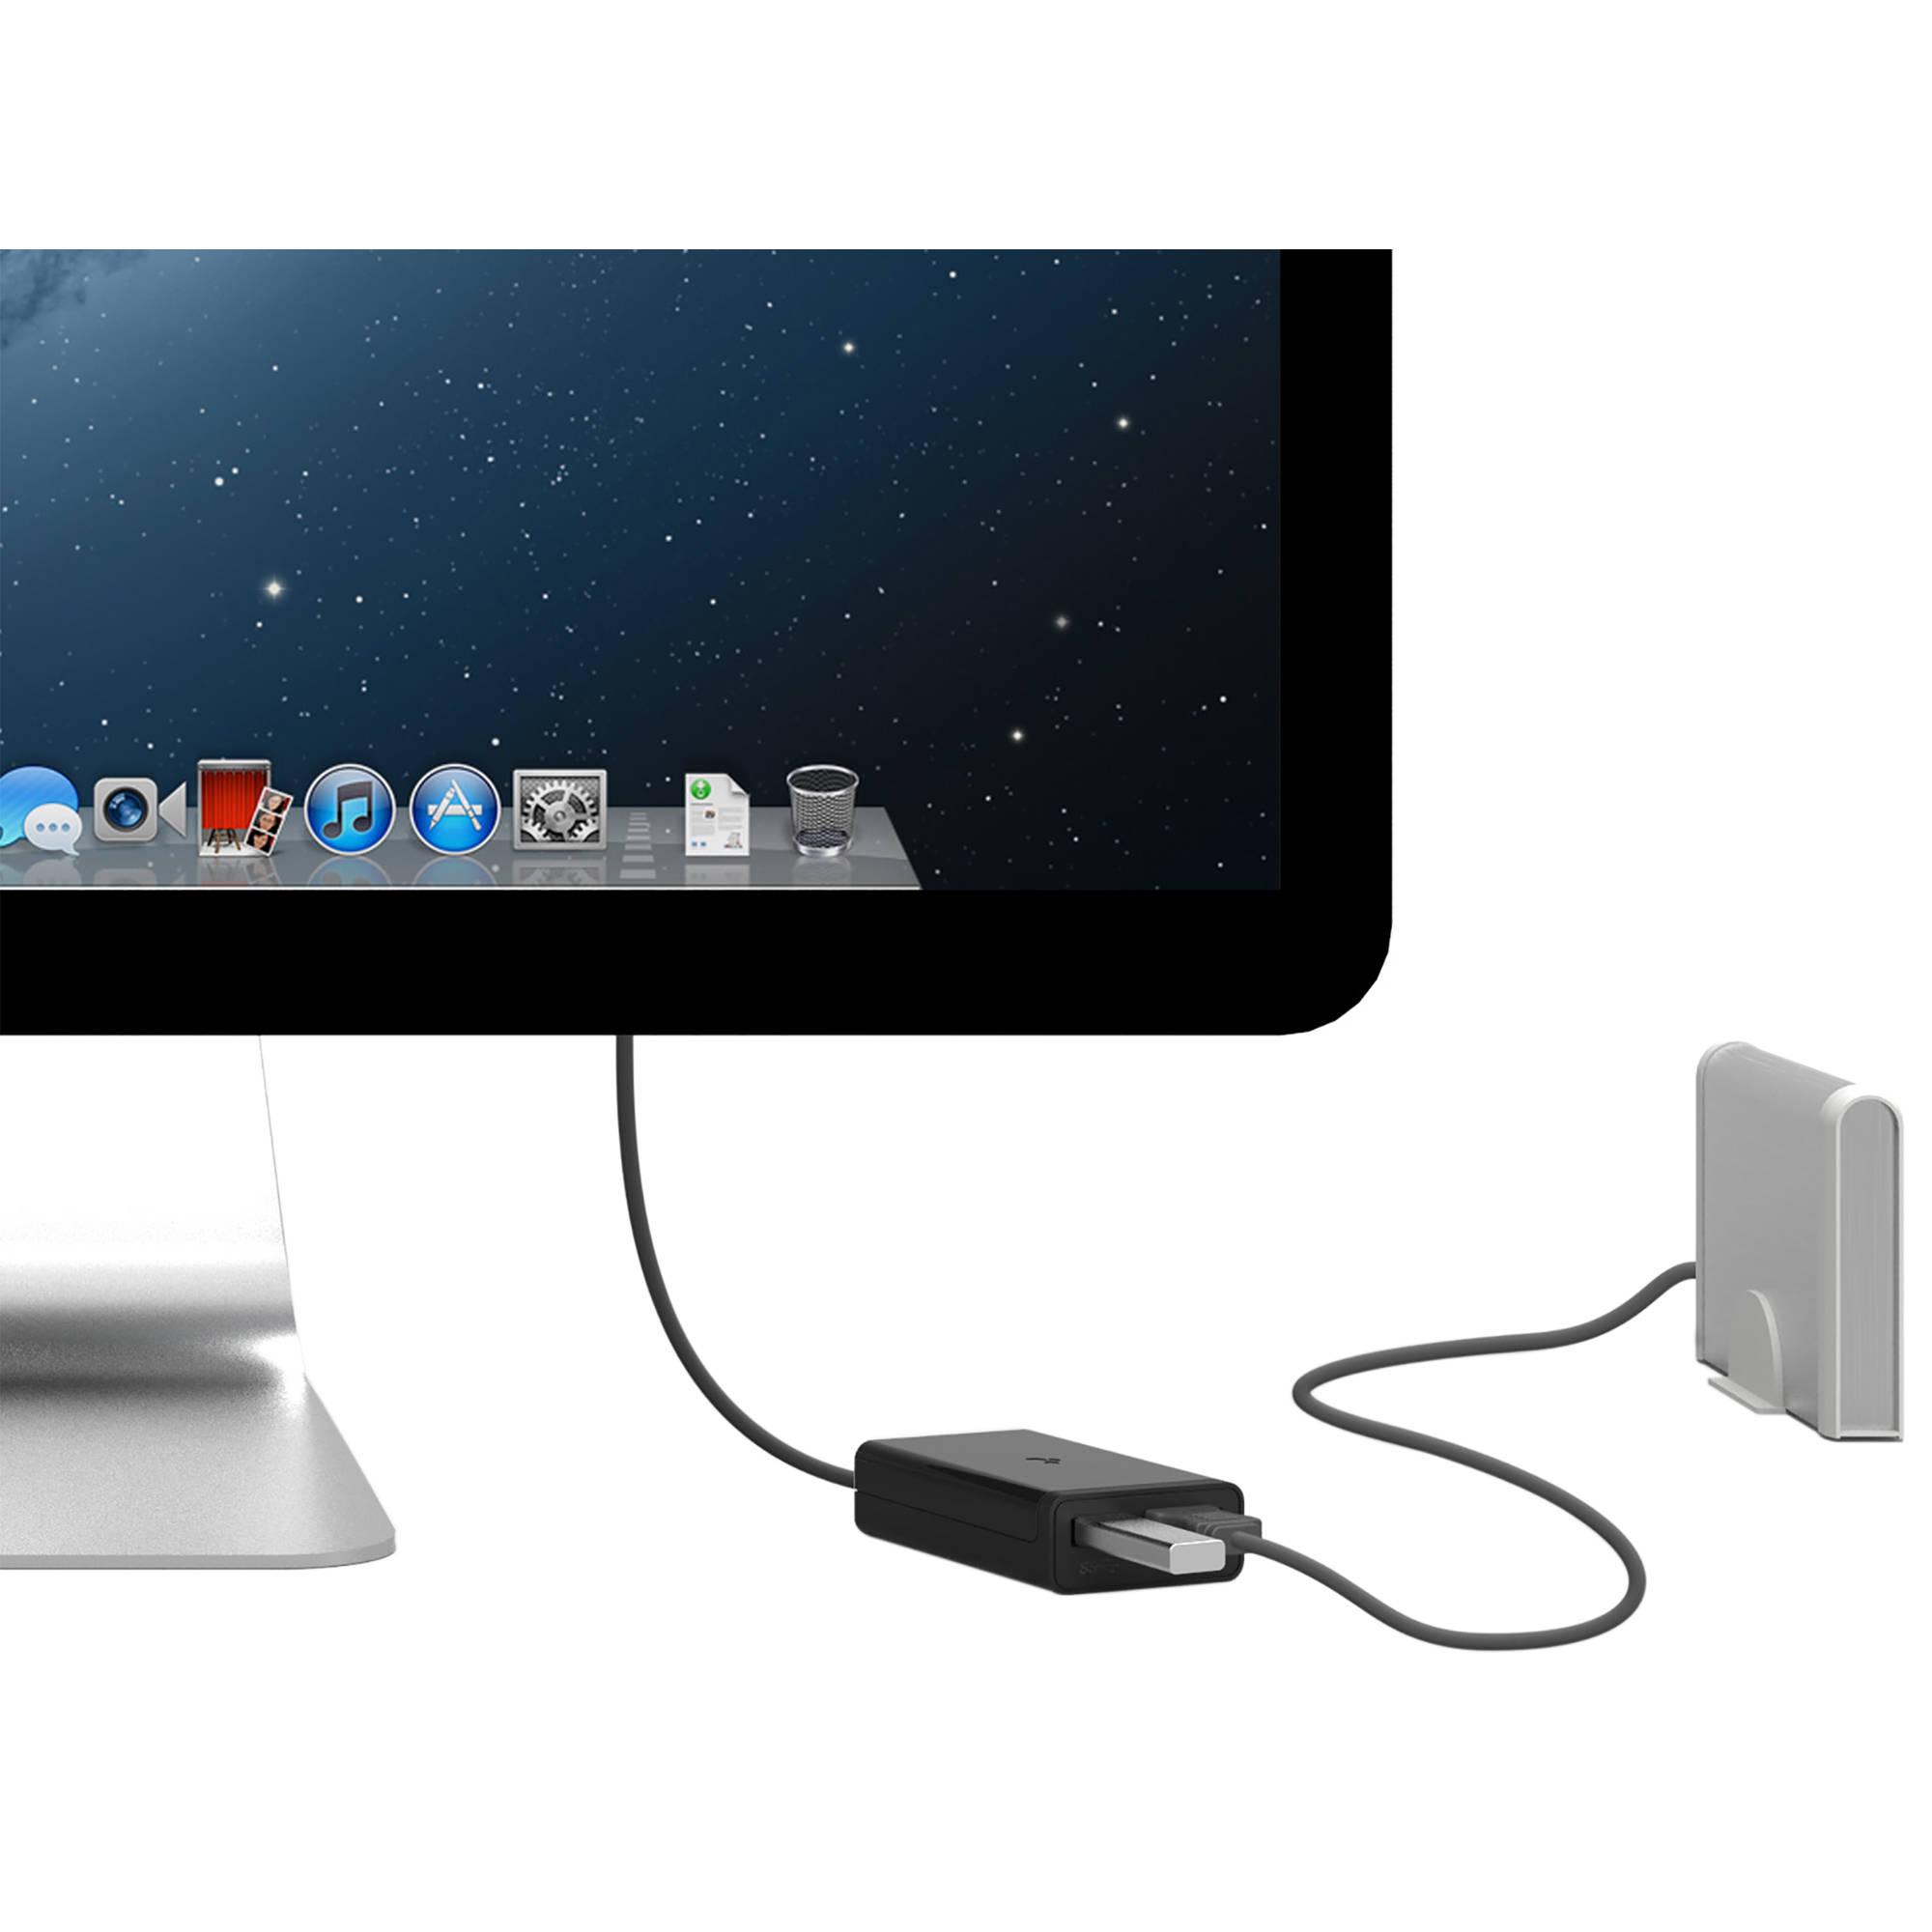 Adaptador USB 3.0 y SATA Kanex KTU10 negro